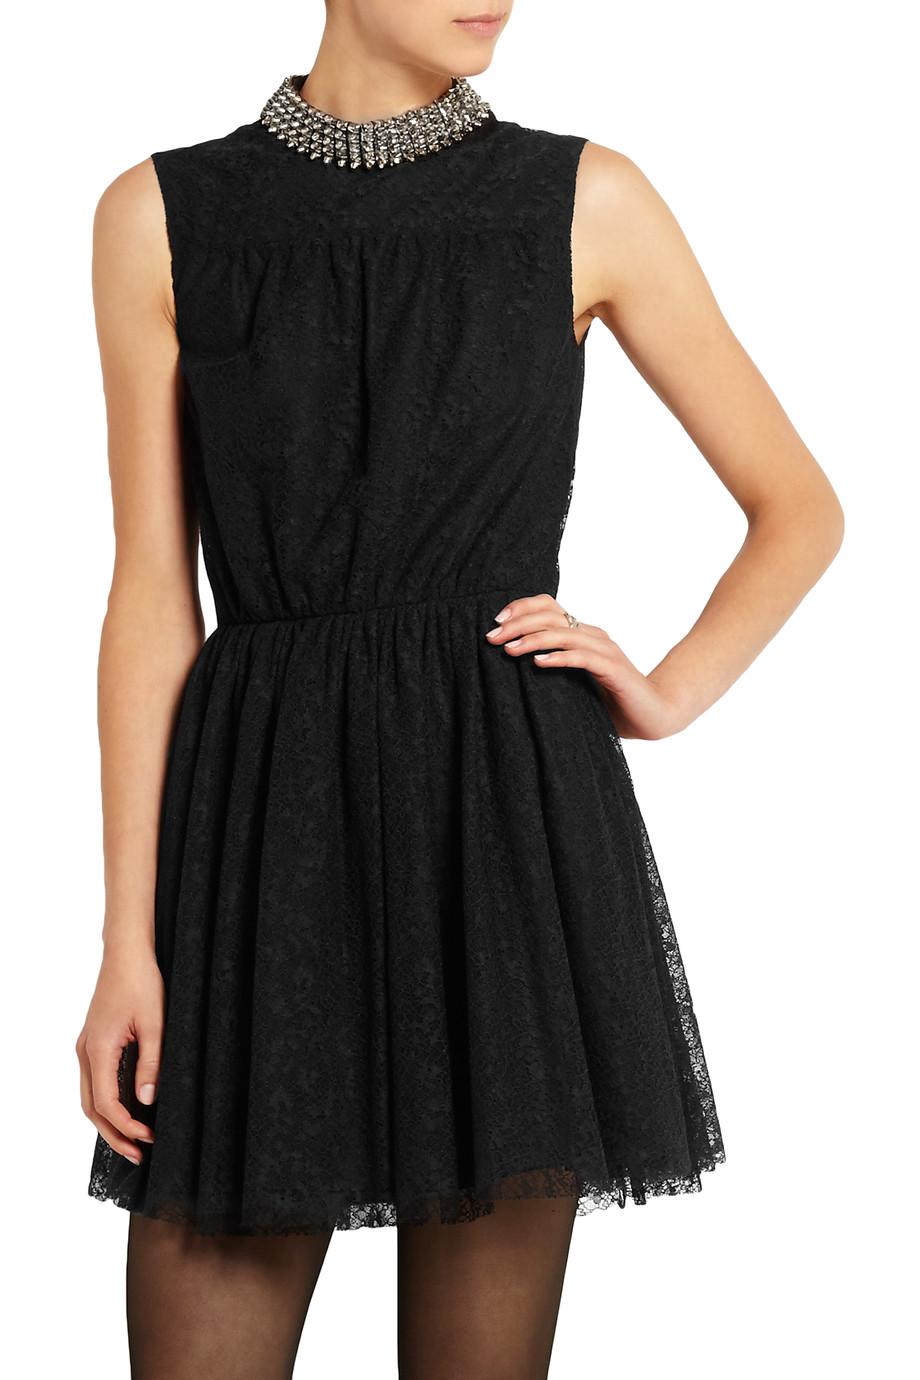 Saint Laurent Studded Mini Dress.jpg